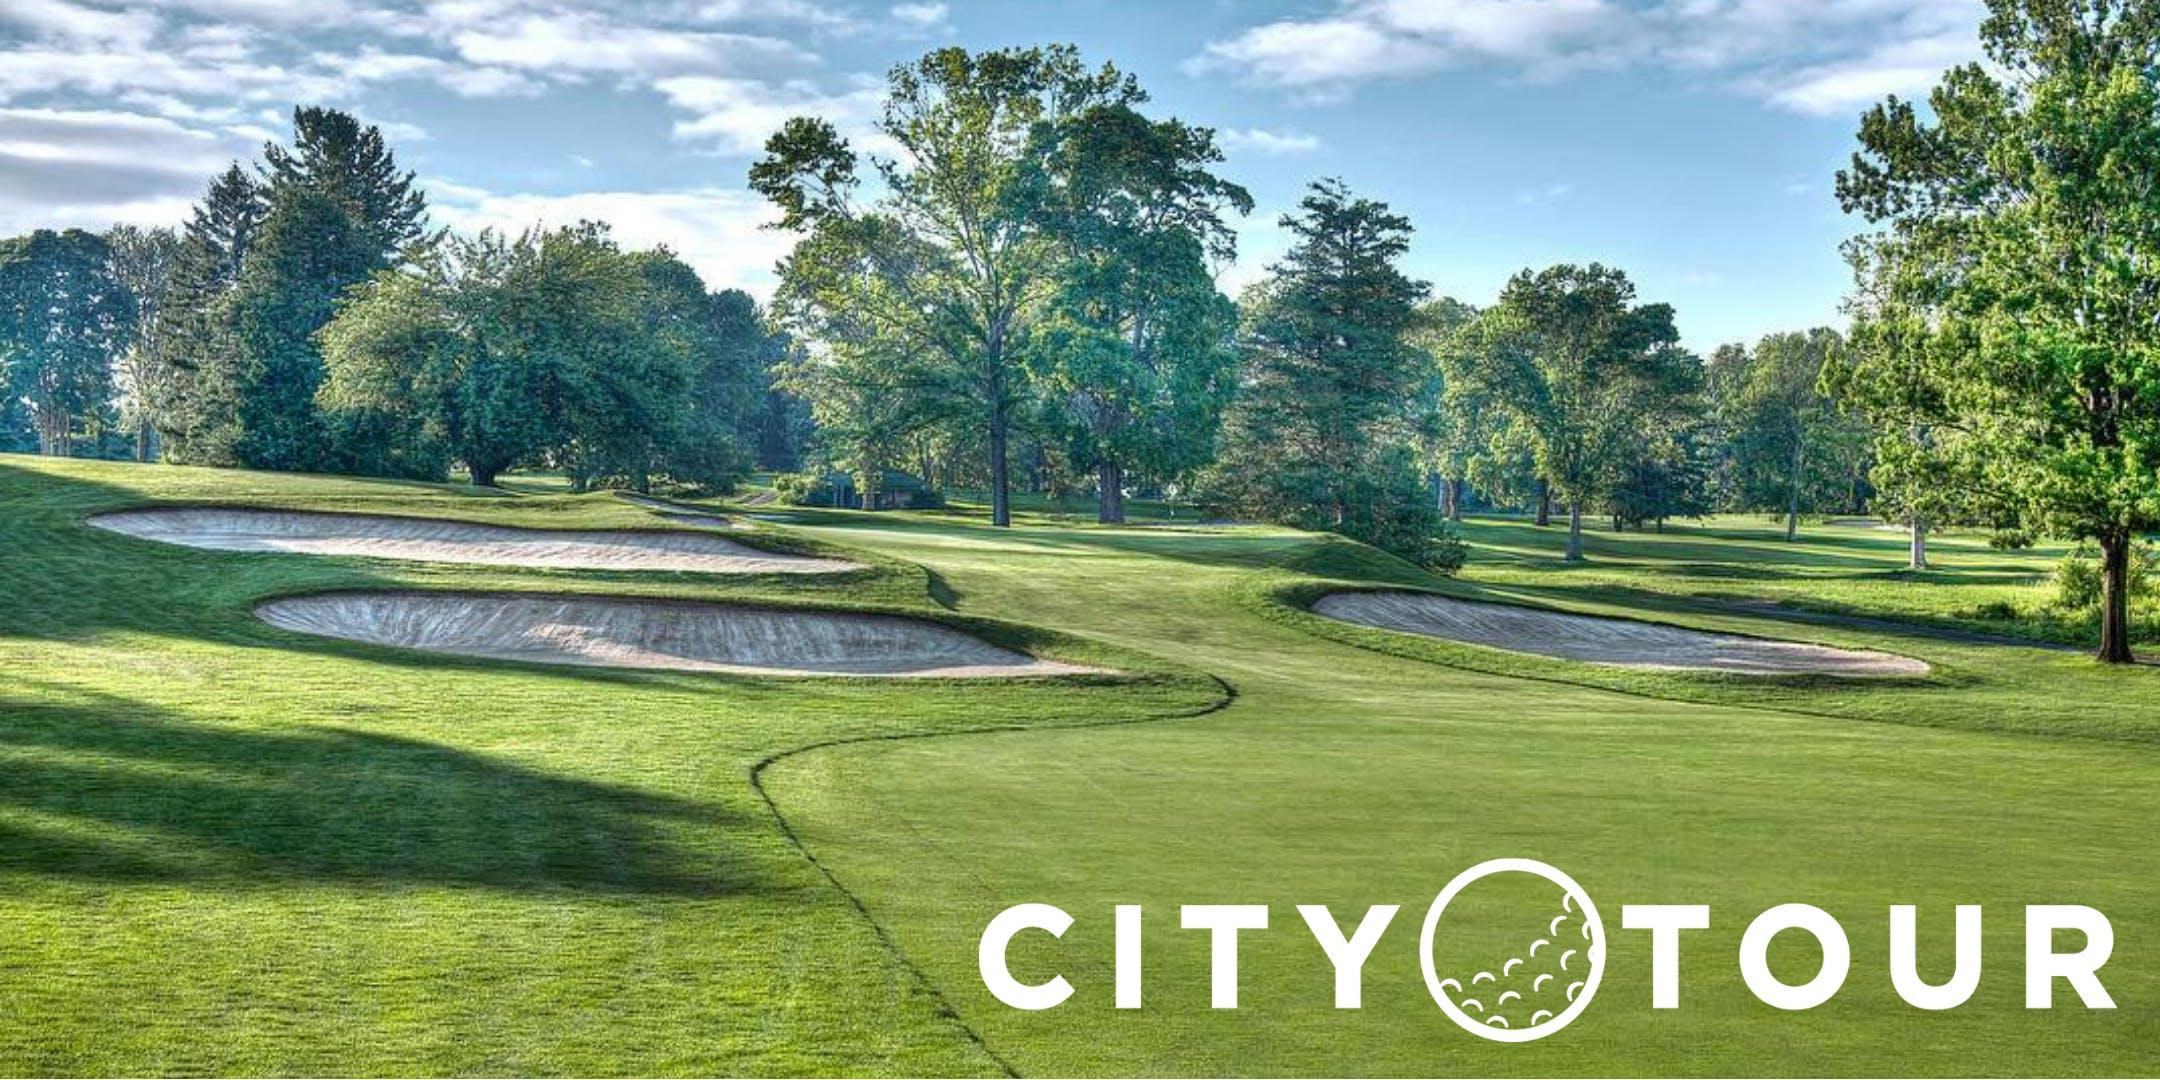 Atlanta City Tour - Chateau Elan